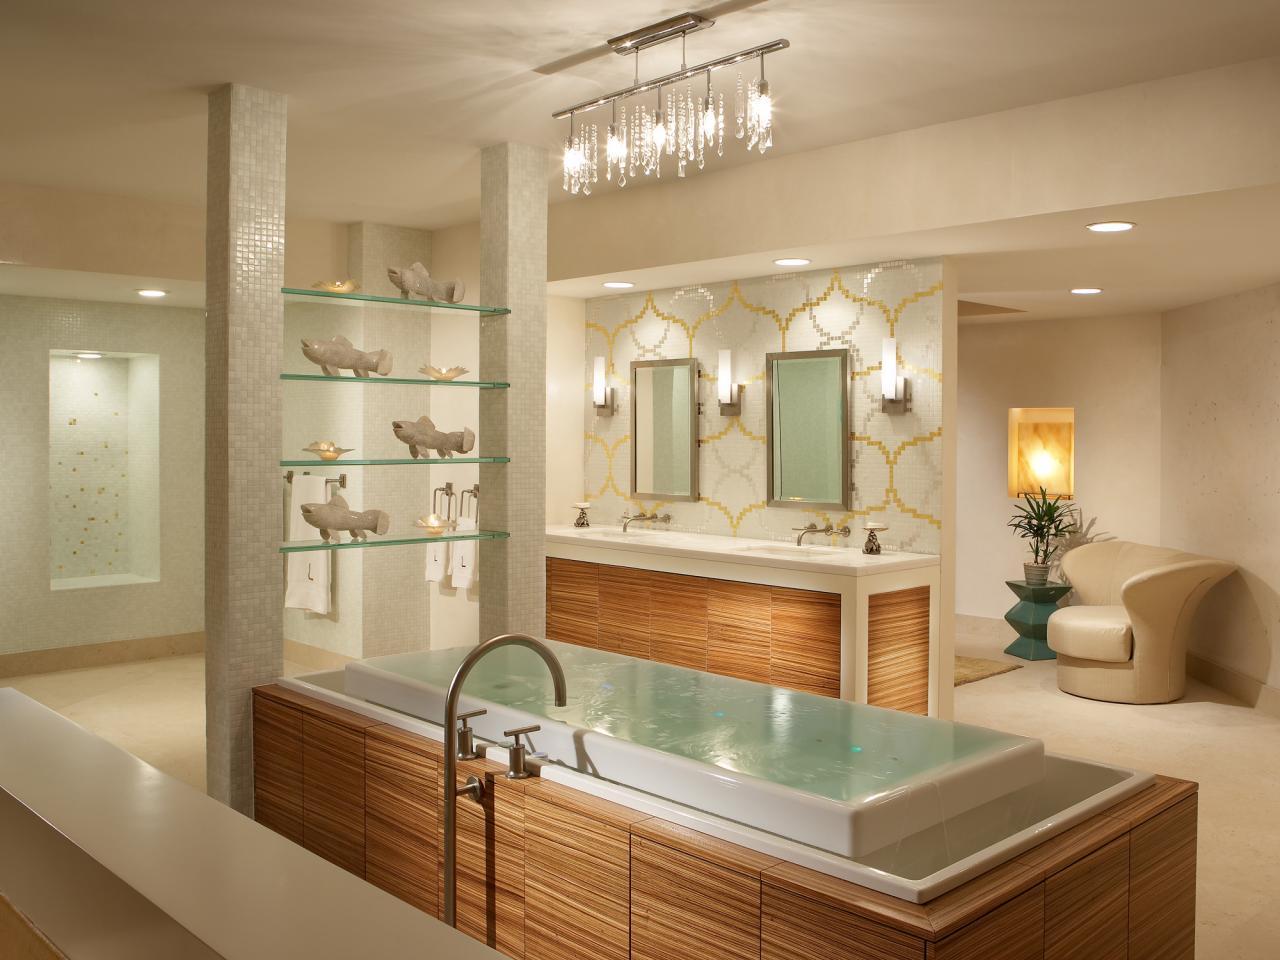 luxury bathroom lighting design tips  bathroom lighting tips for designing the in luxury essentials guide. Luxury Bathroom Lighting Design Tips  Fabulous Bathroom Lighting